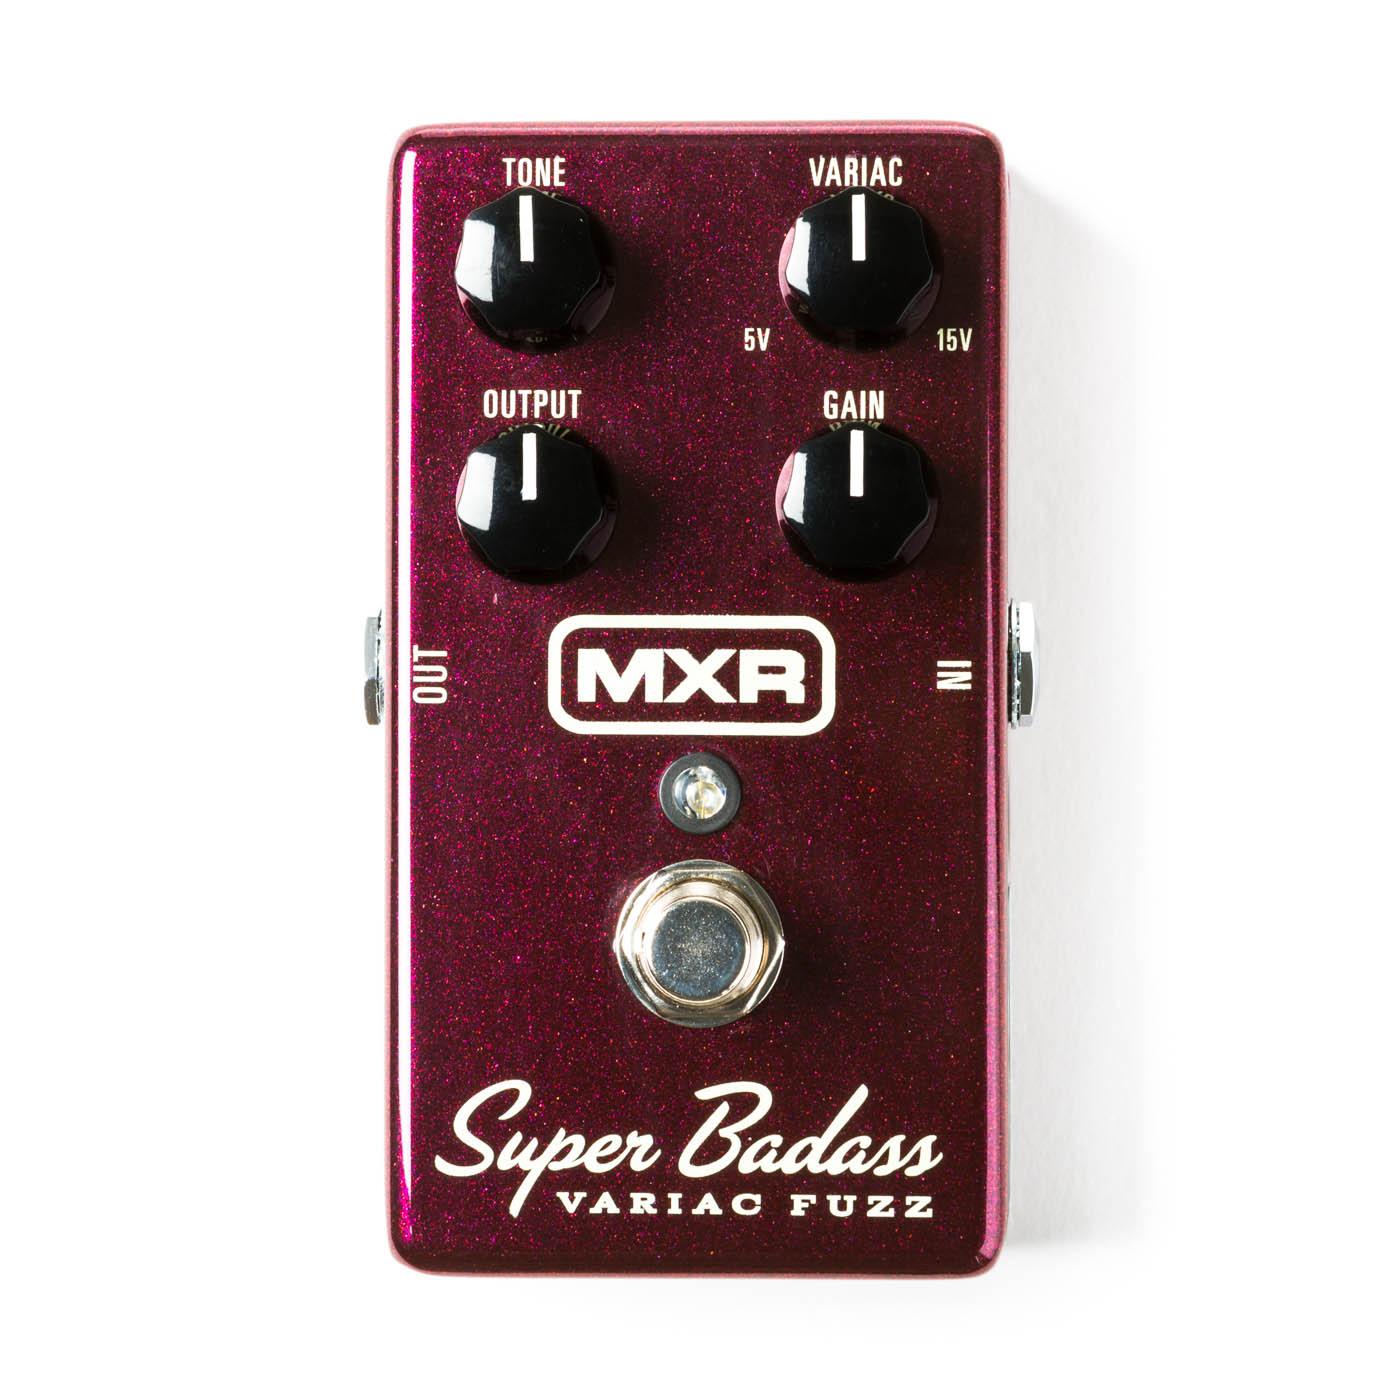 MXR Super Badass Variac Fuzz